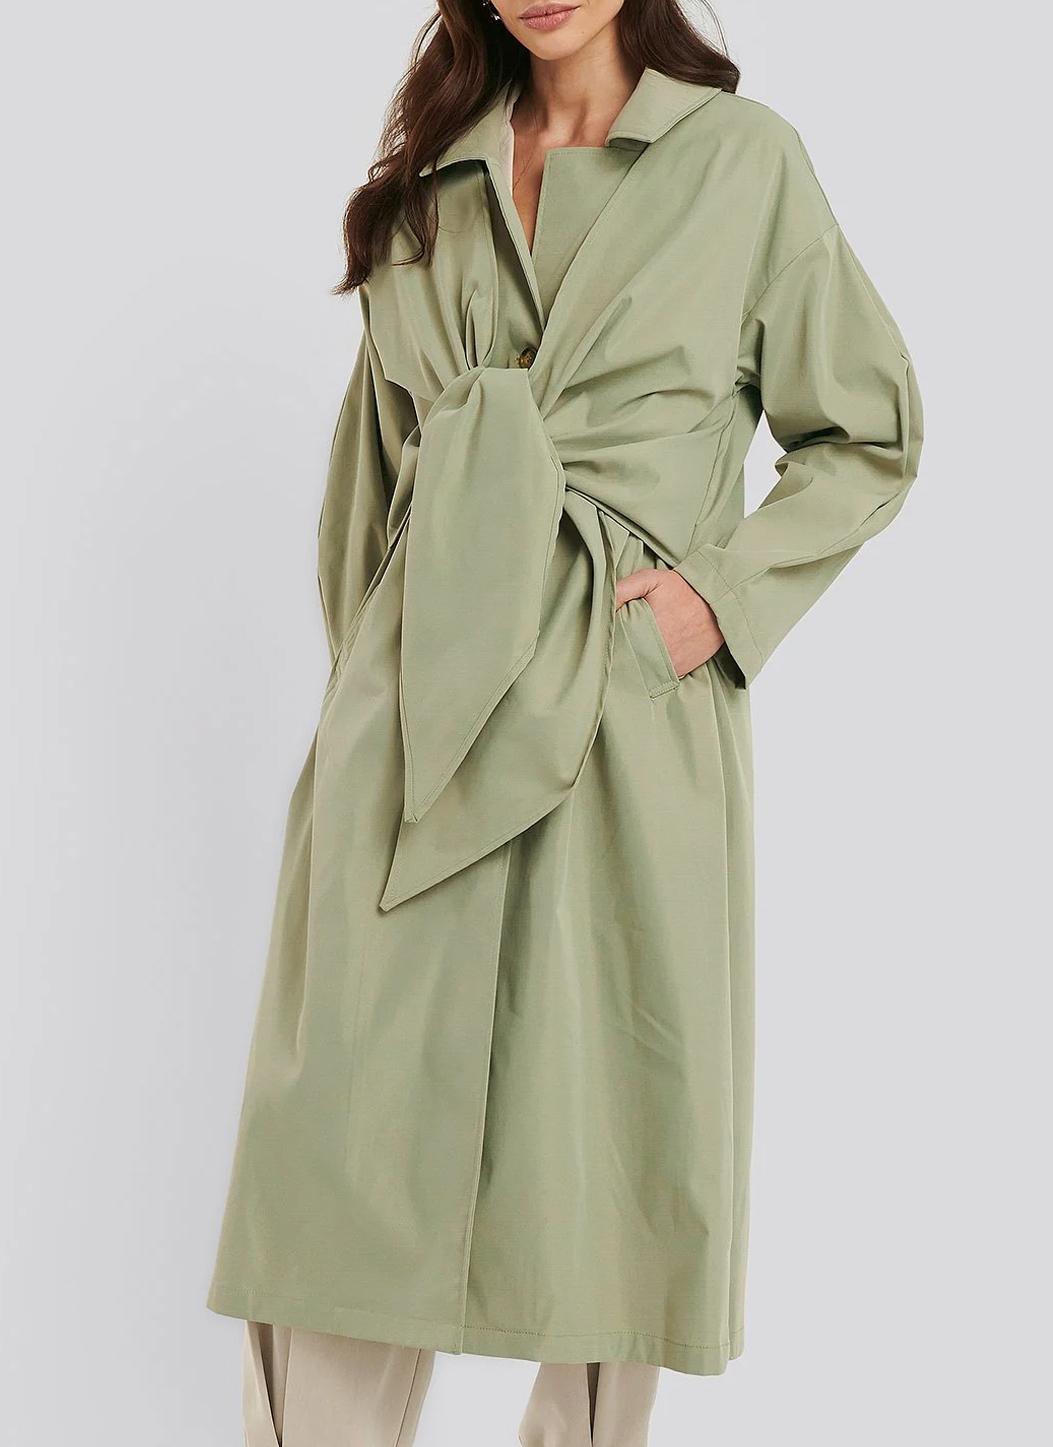 green trench coat women